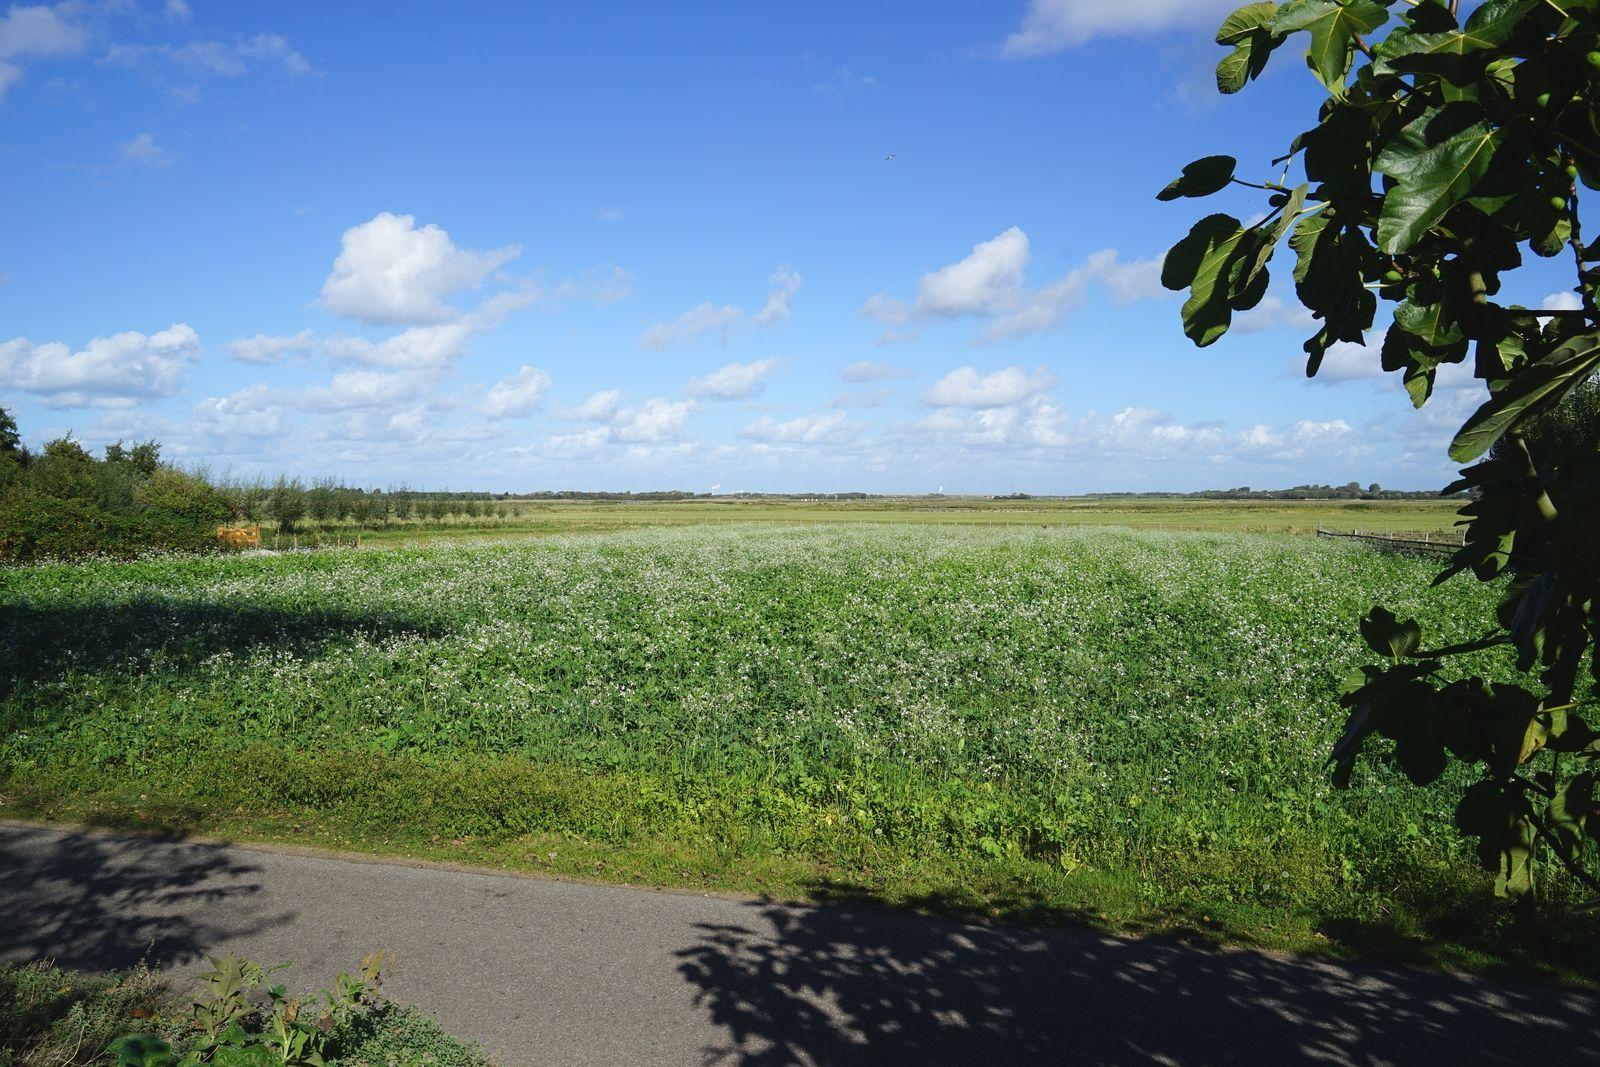 Loevesteijn - Ouddorp